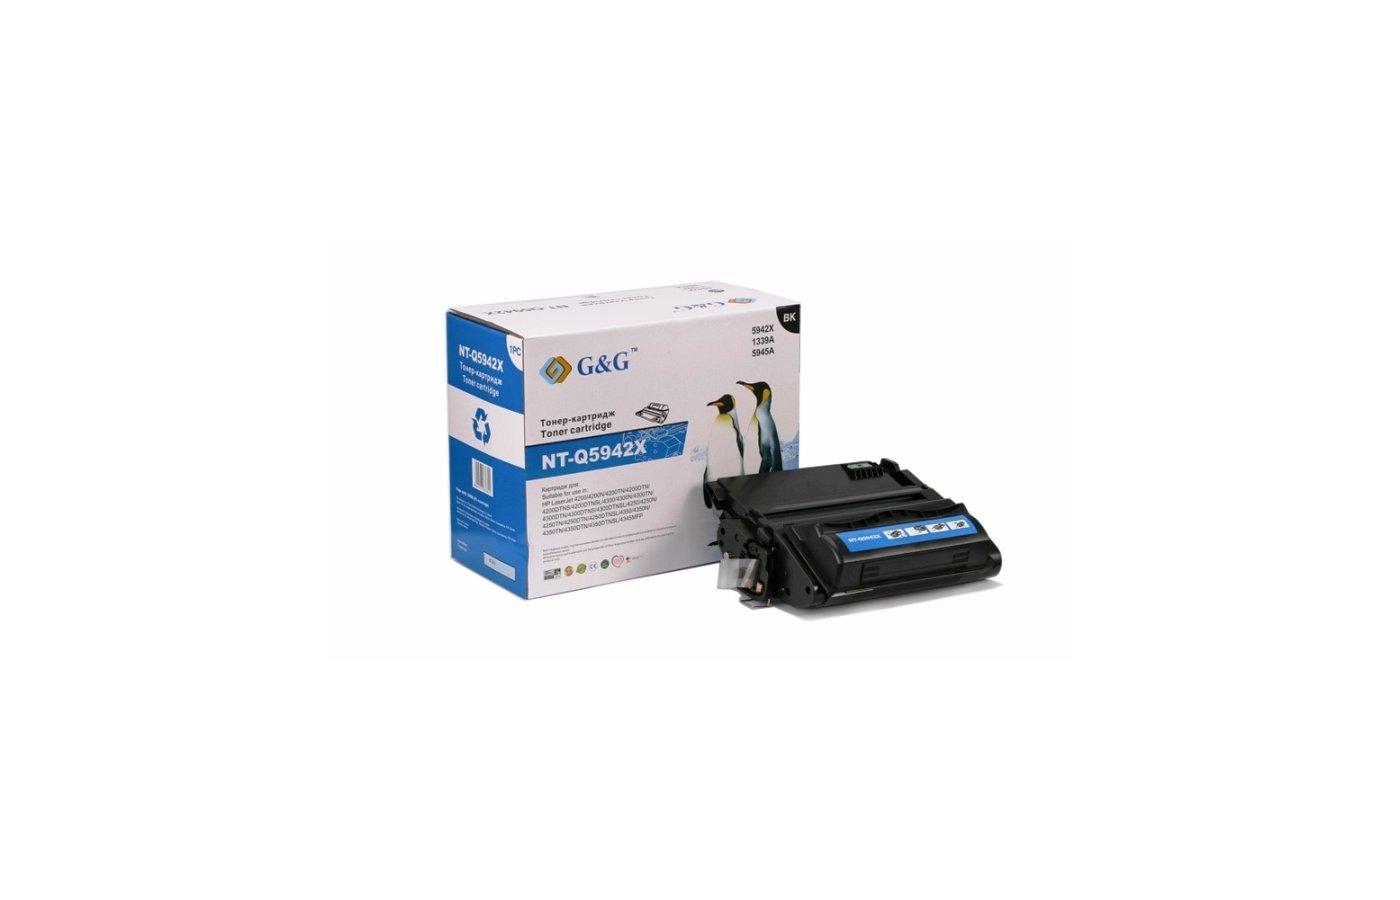 Картридж лазерный GG NT-Q5942X Совместимый для HP LaserJet 4200/4250/4300/4350/4345 (20000стр)